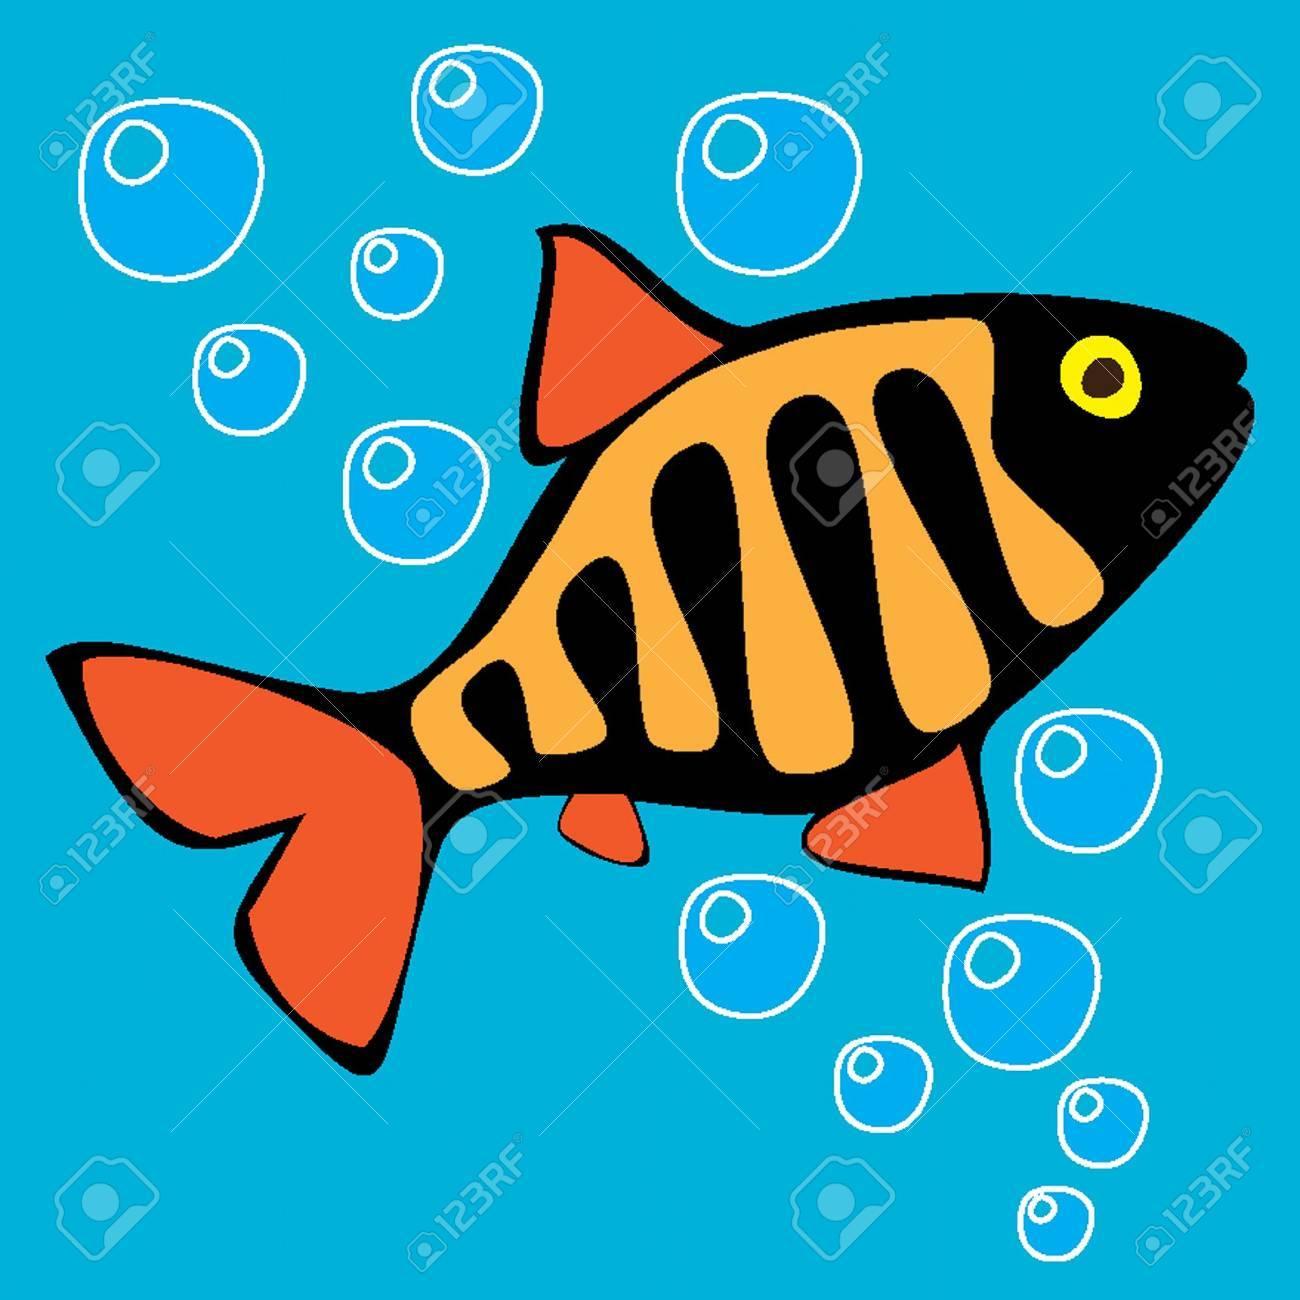 Beautiful colored small fish. Stock Photo - 6741899